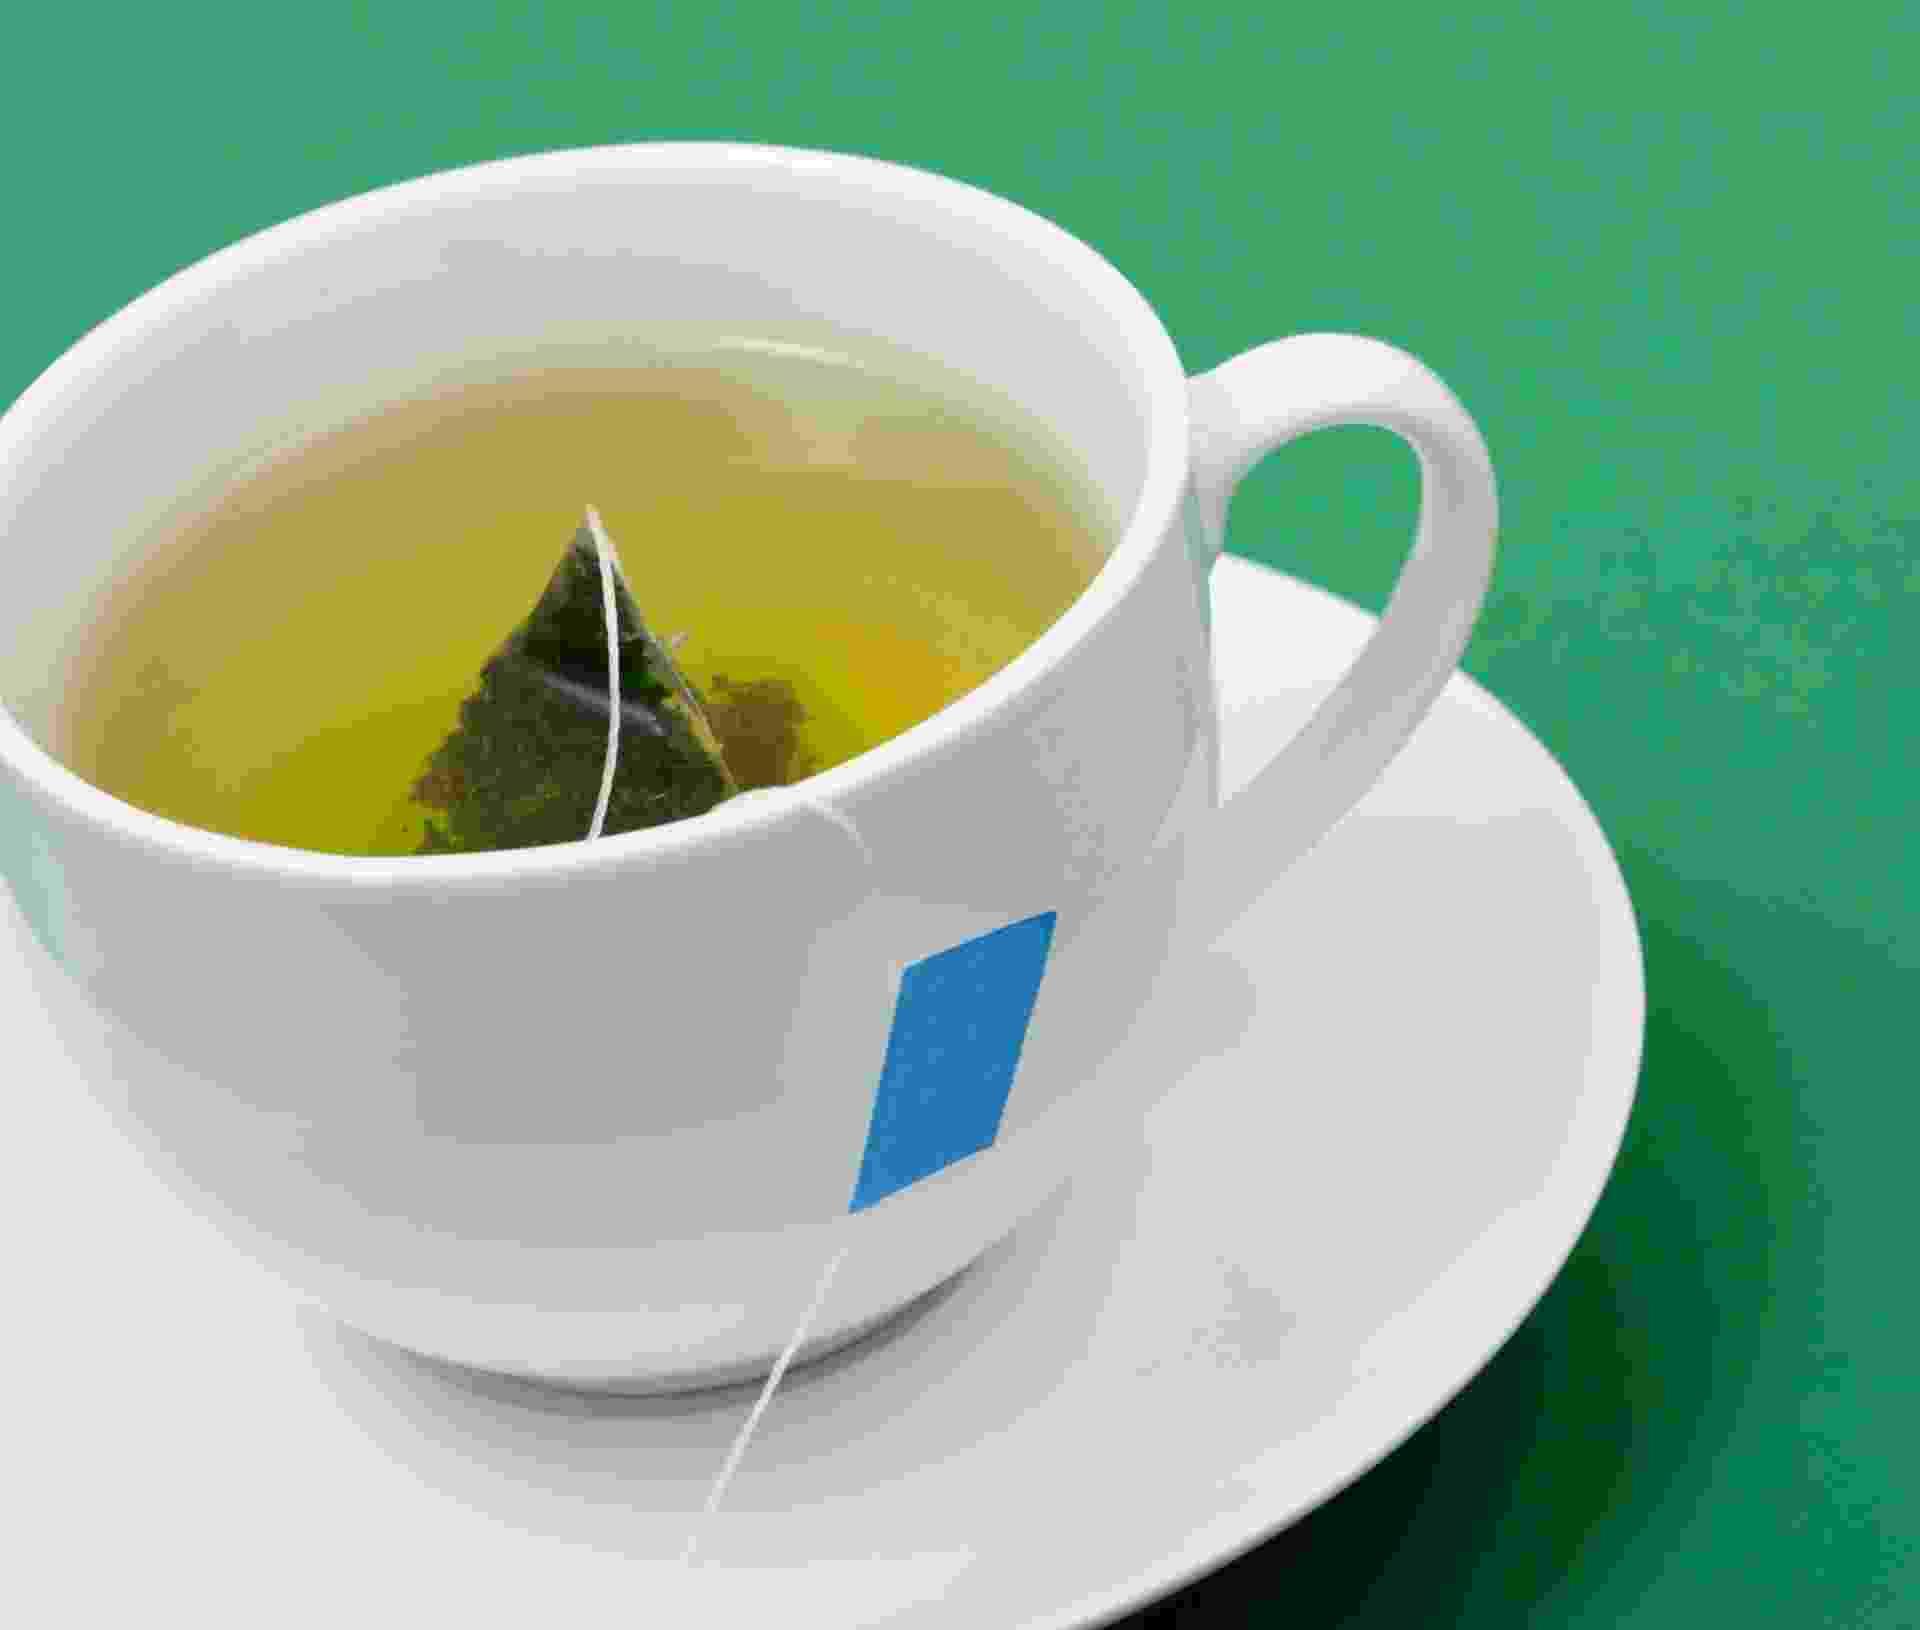 chá verde - Thinkstock